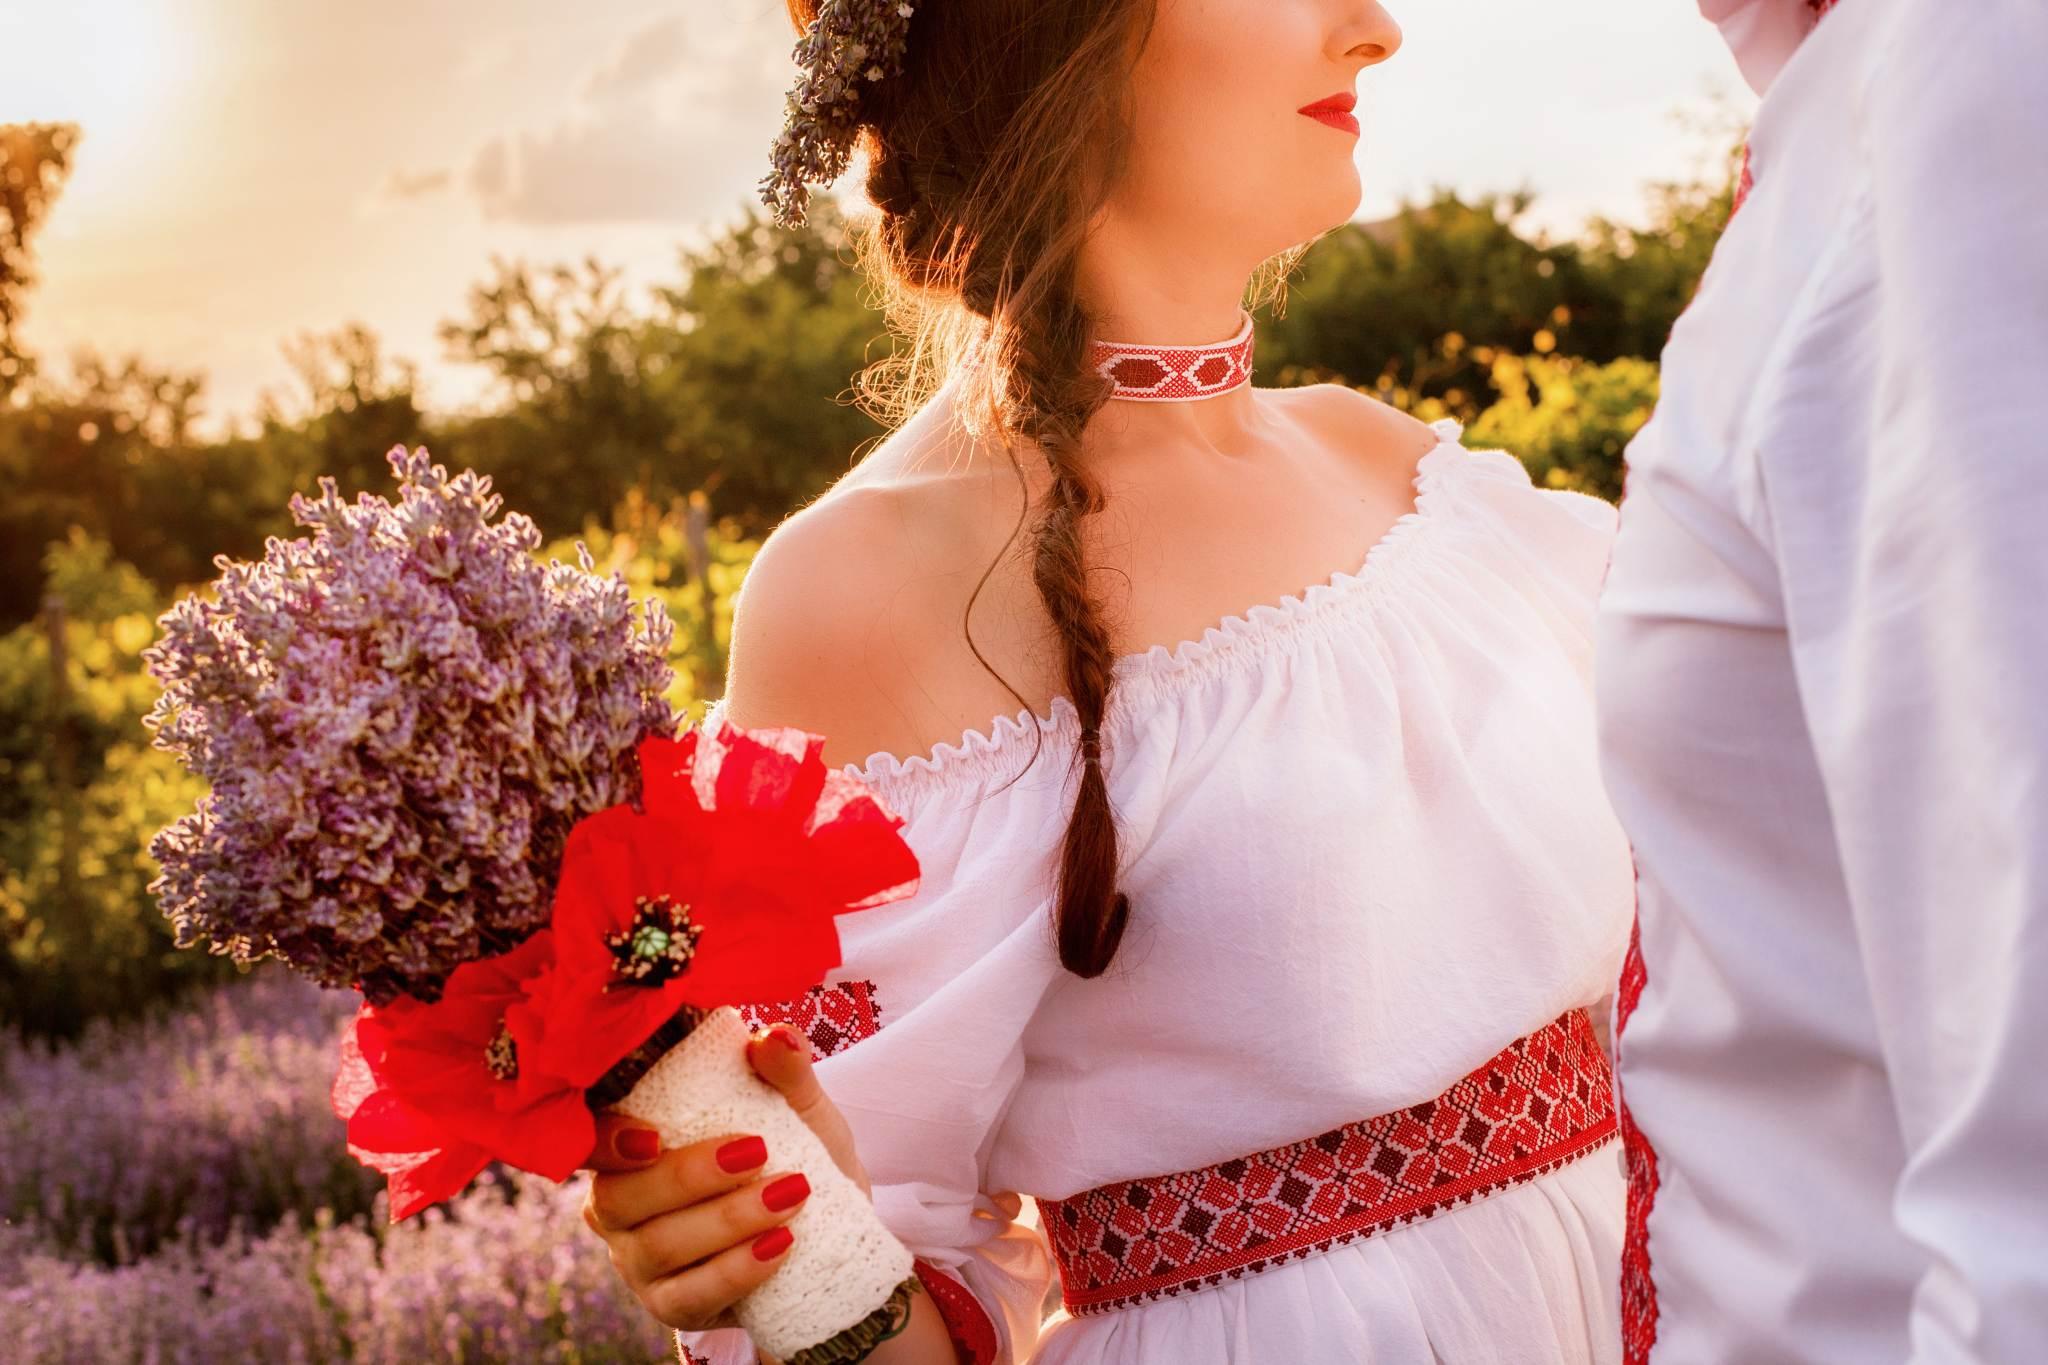 fotografii-nunta-cristina-si-sorin17.jpg